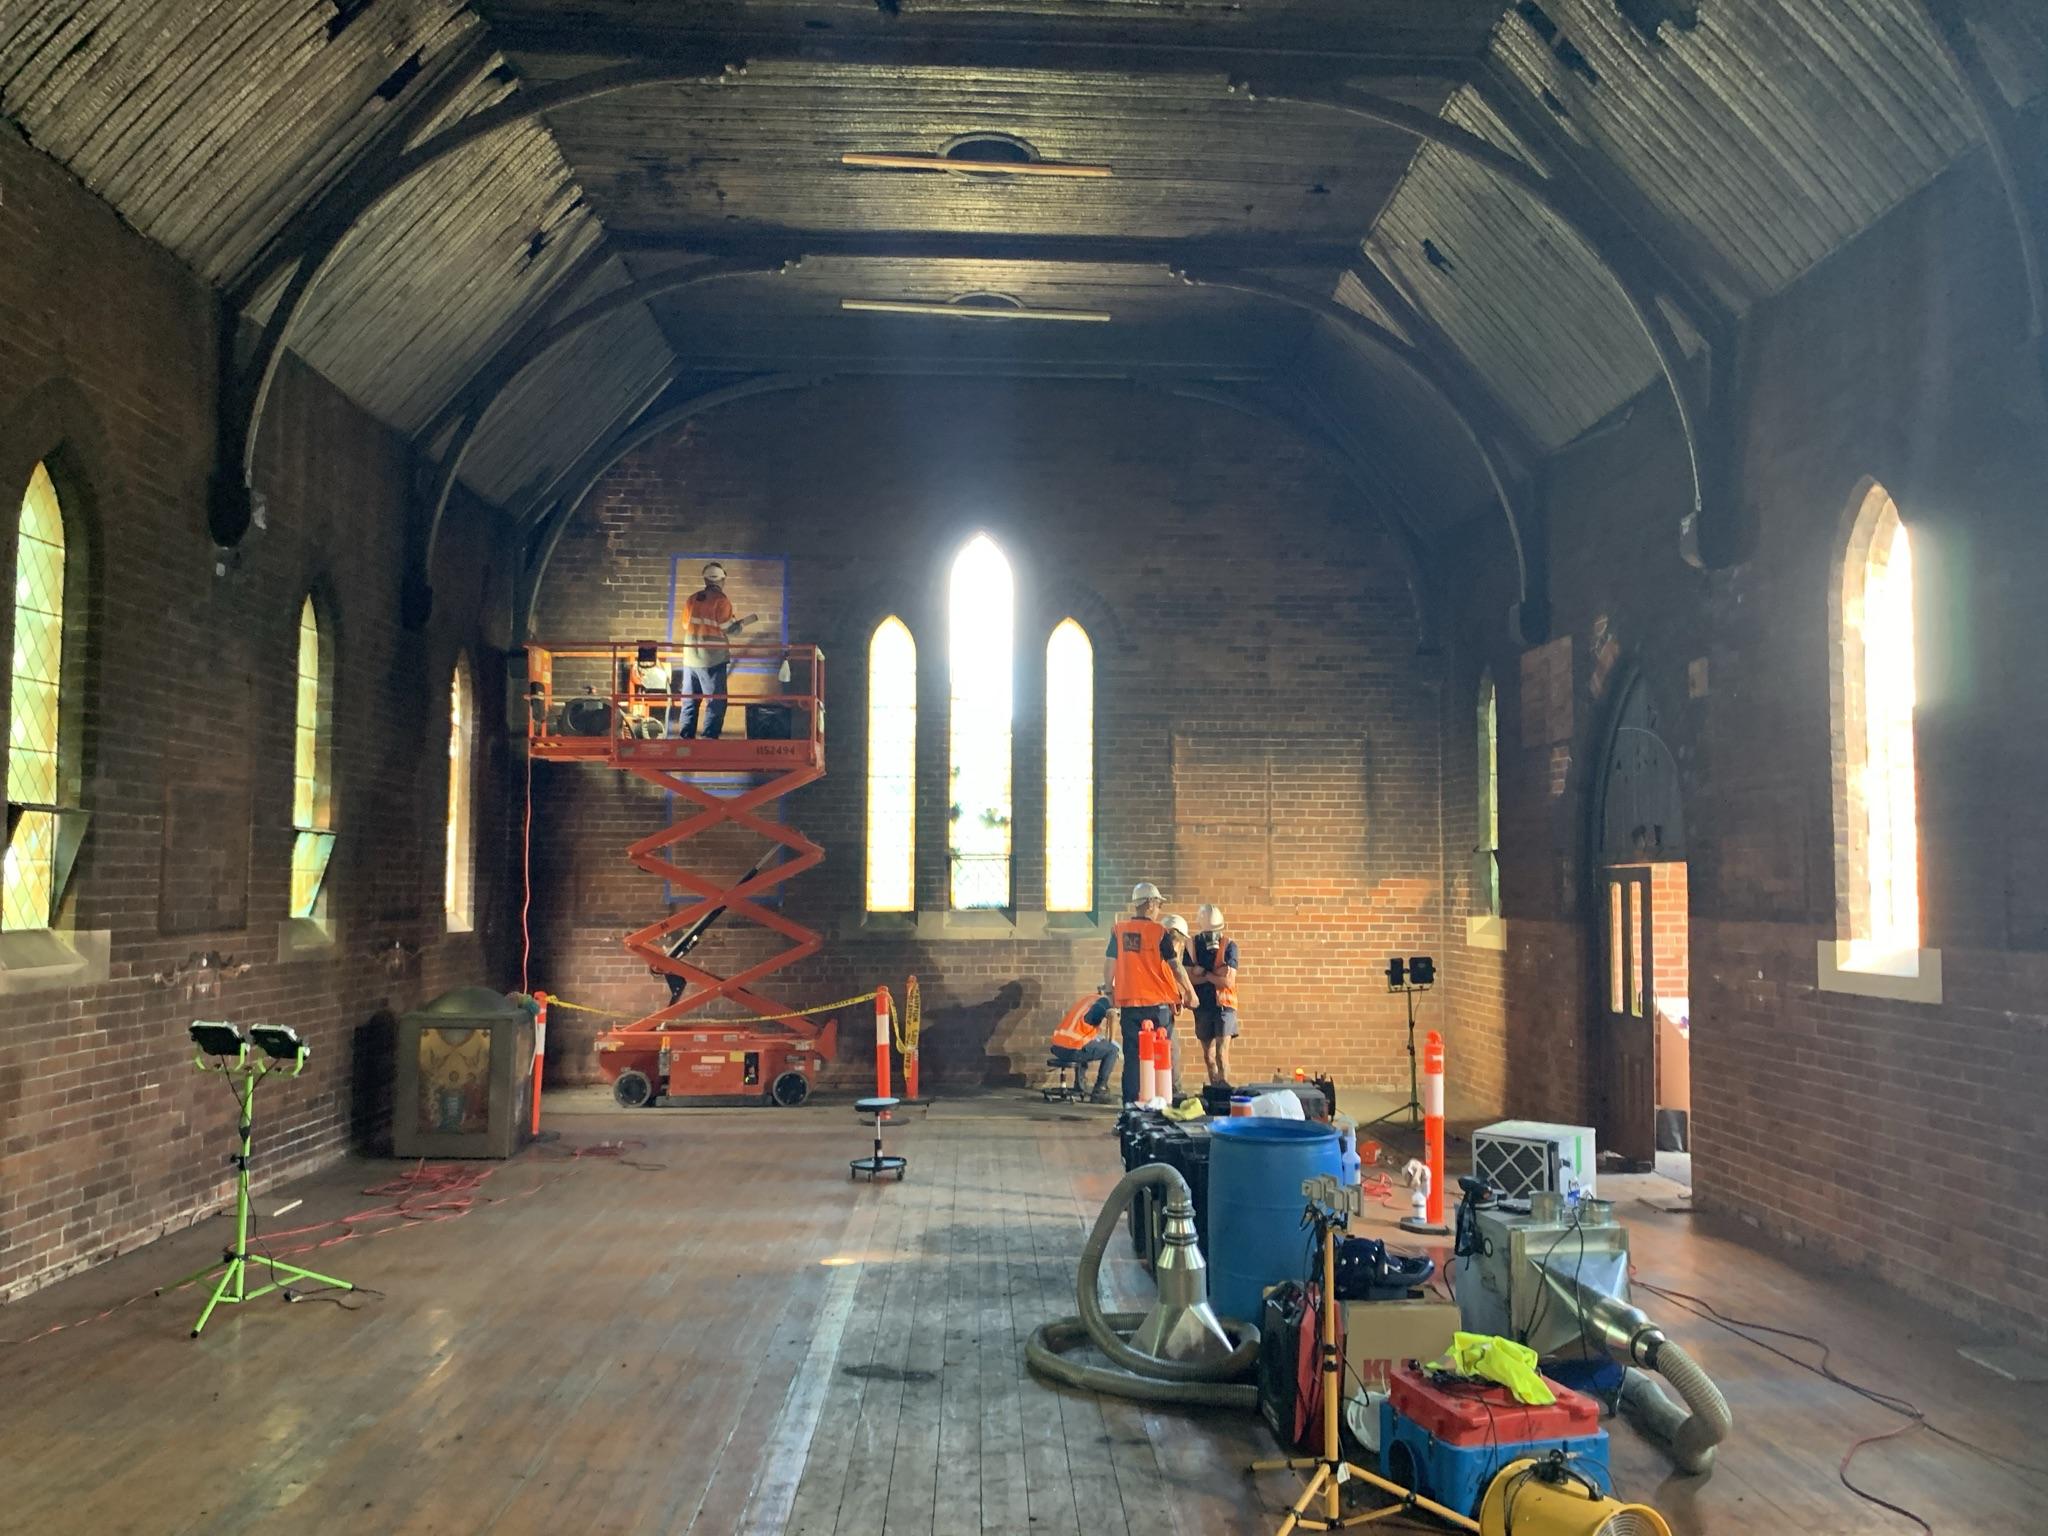 St Paul Coptic Orthodox Church fire damage restoration